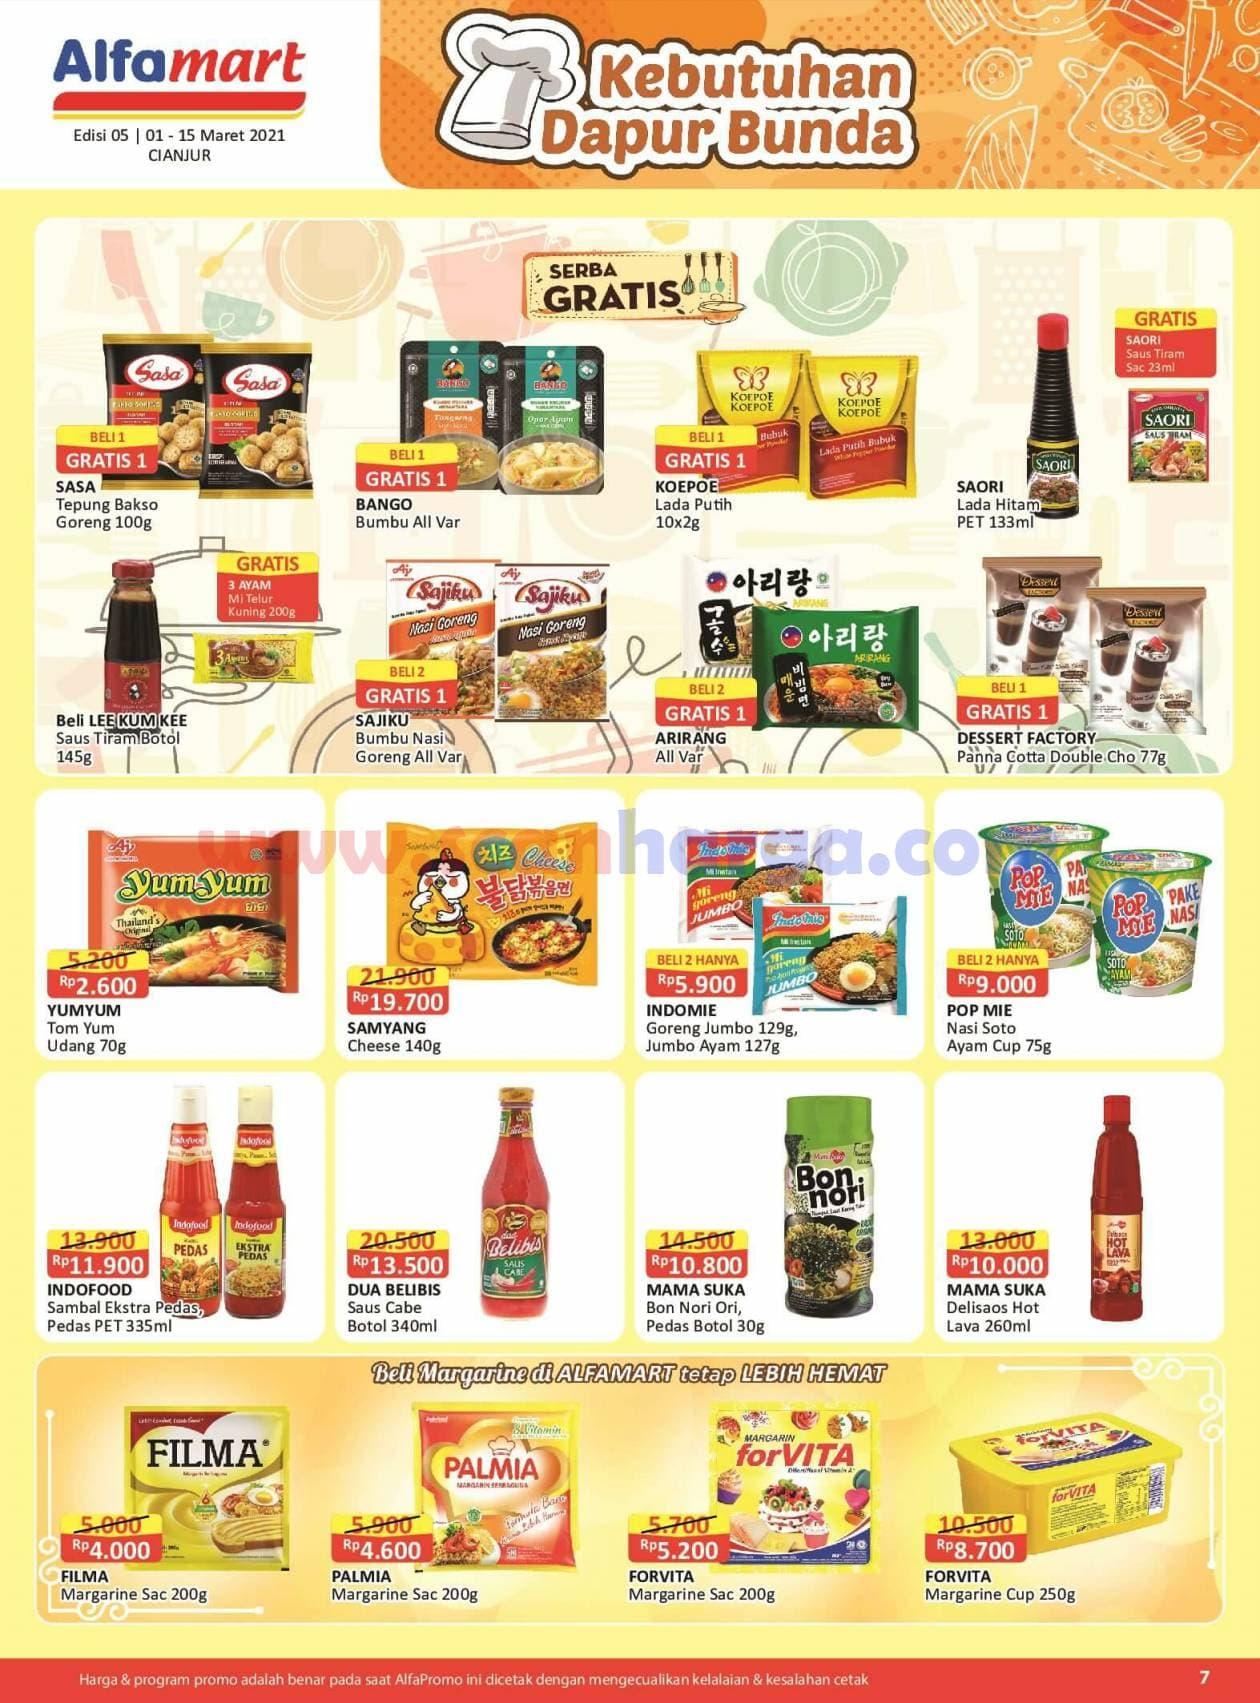 Katalog Promo Alfamart 1 - 15 Maret 2021 7